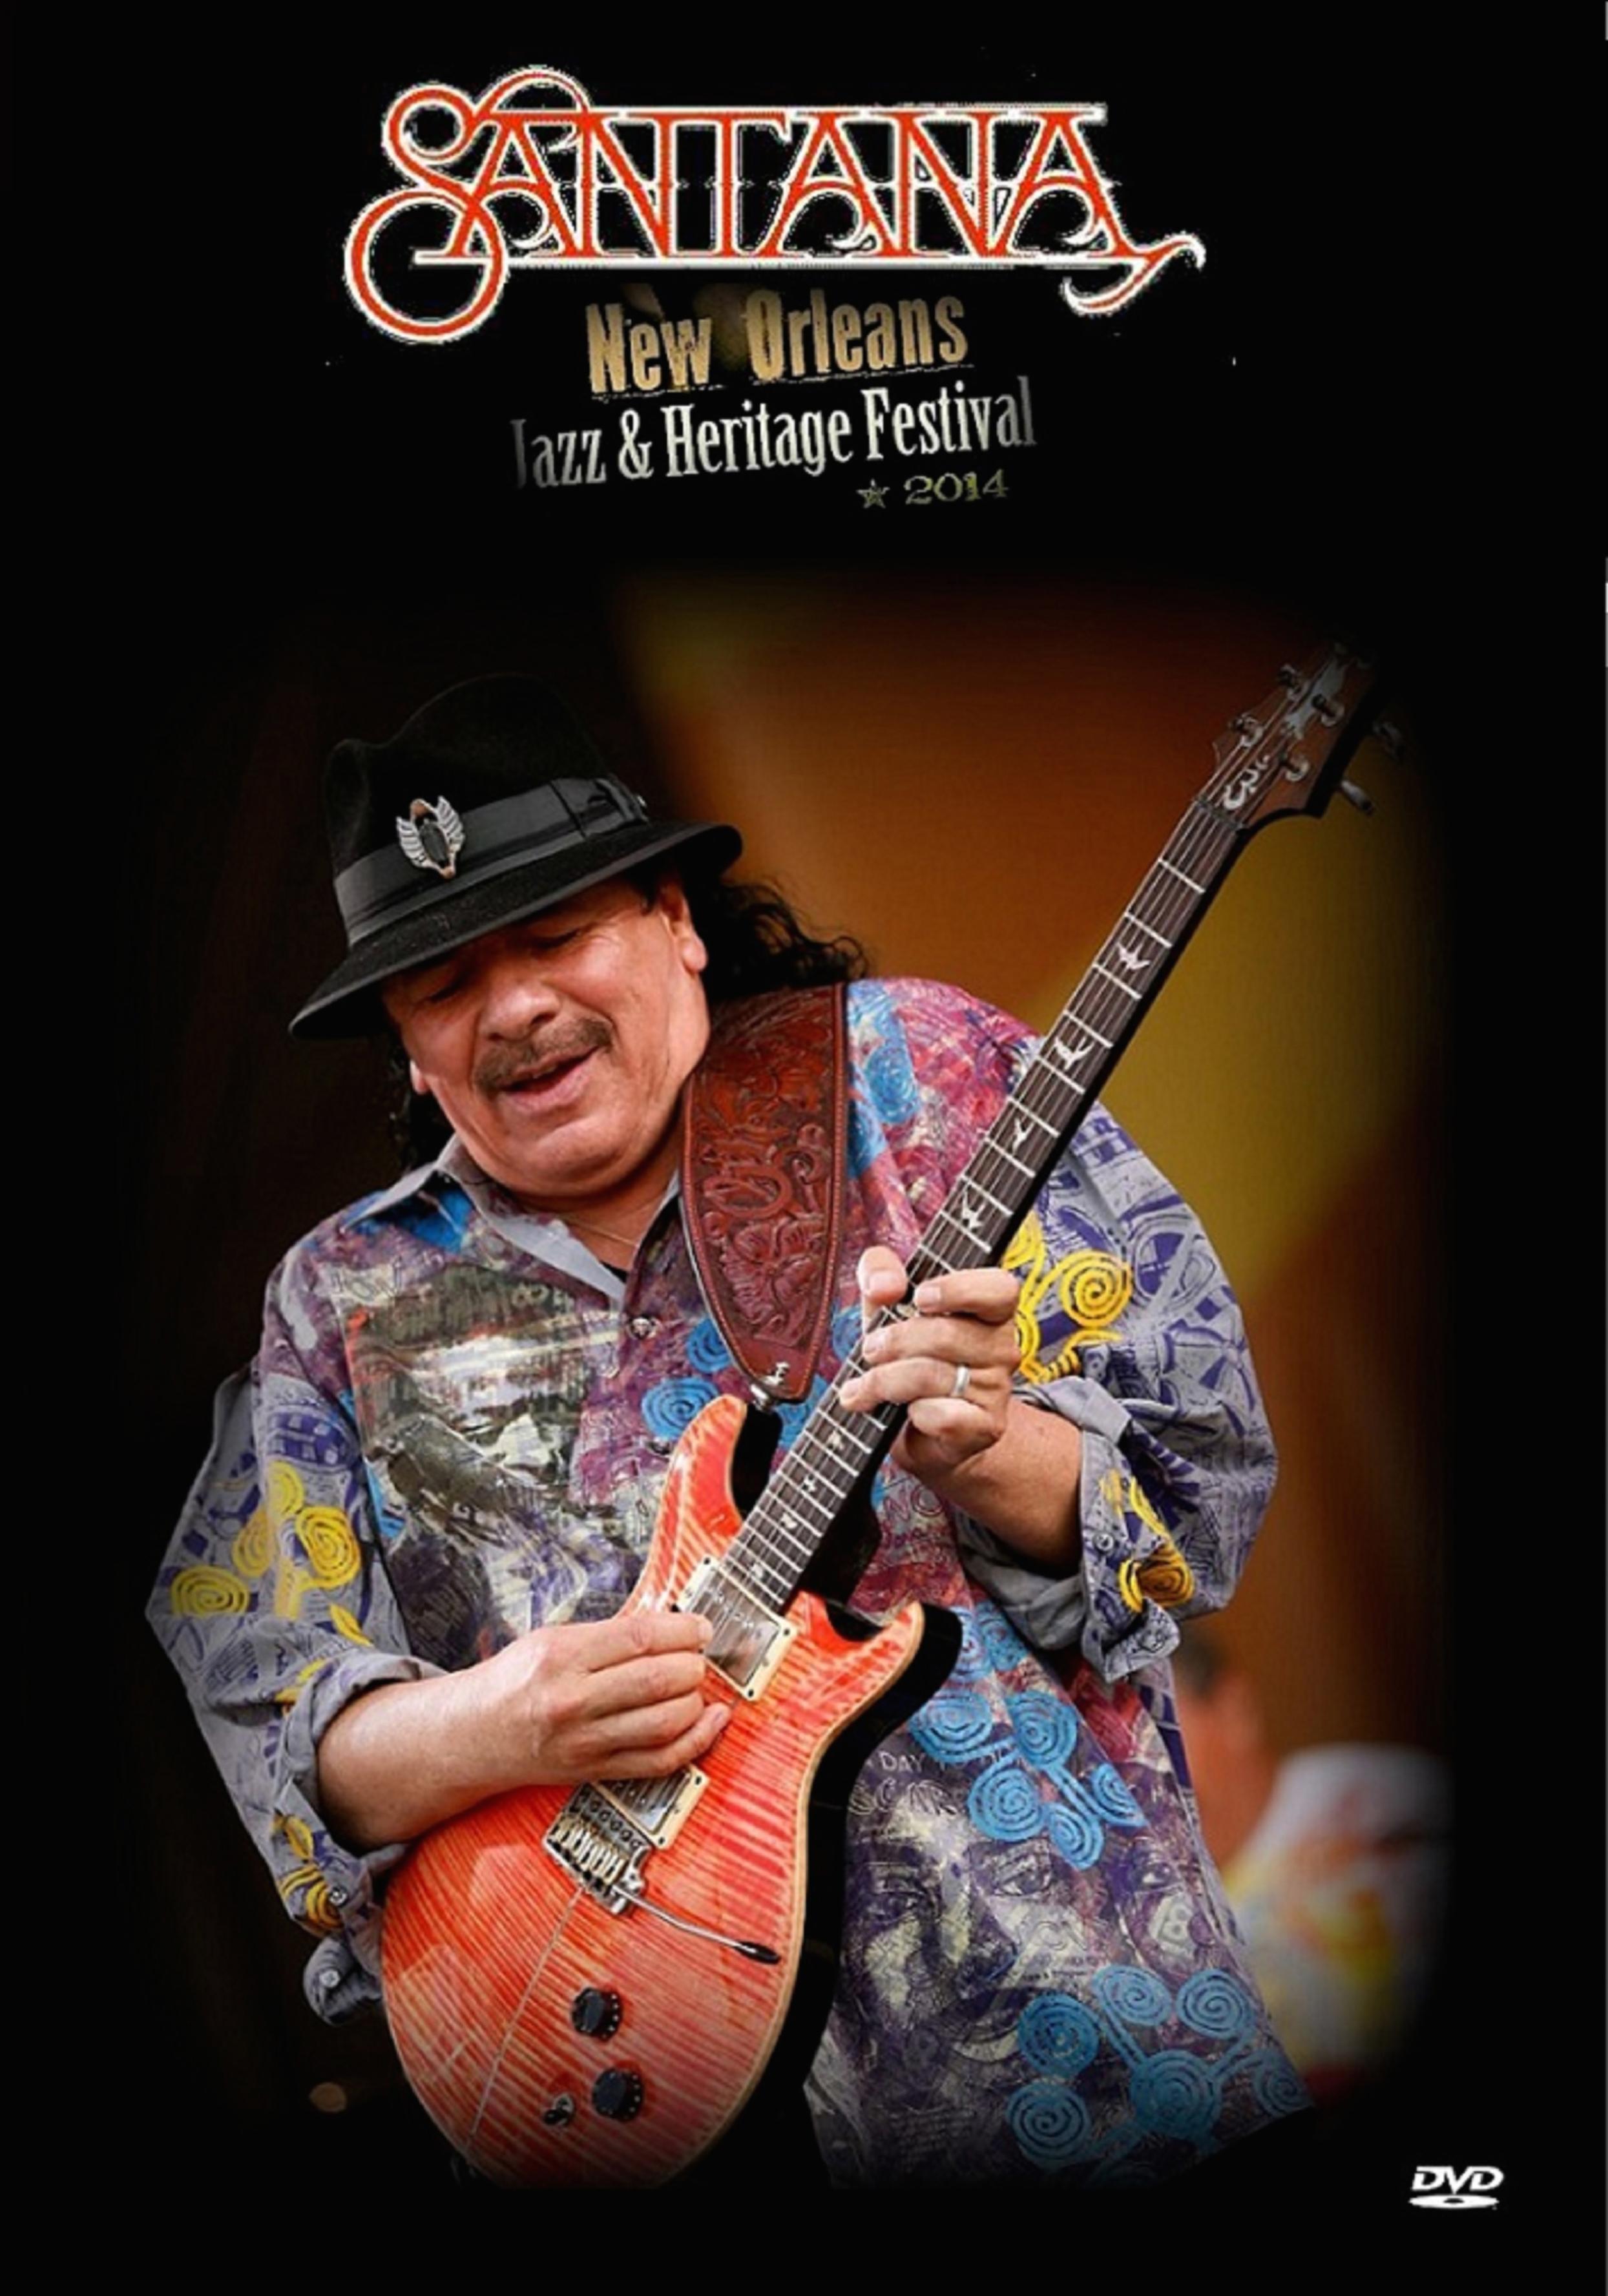 Santana - New Orleans Jazz & Heritage Festival